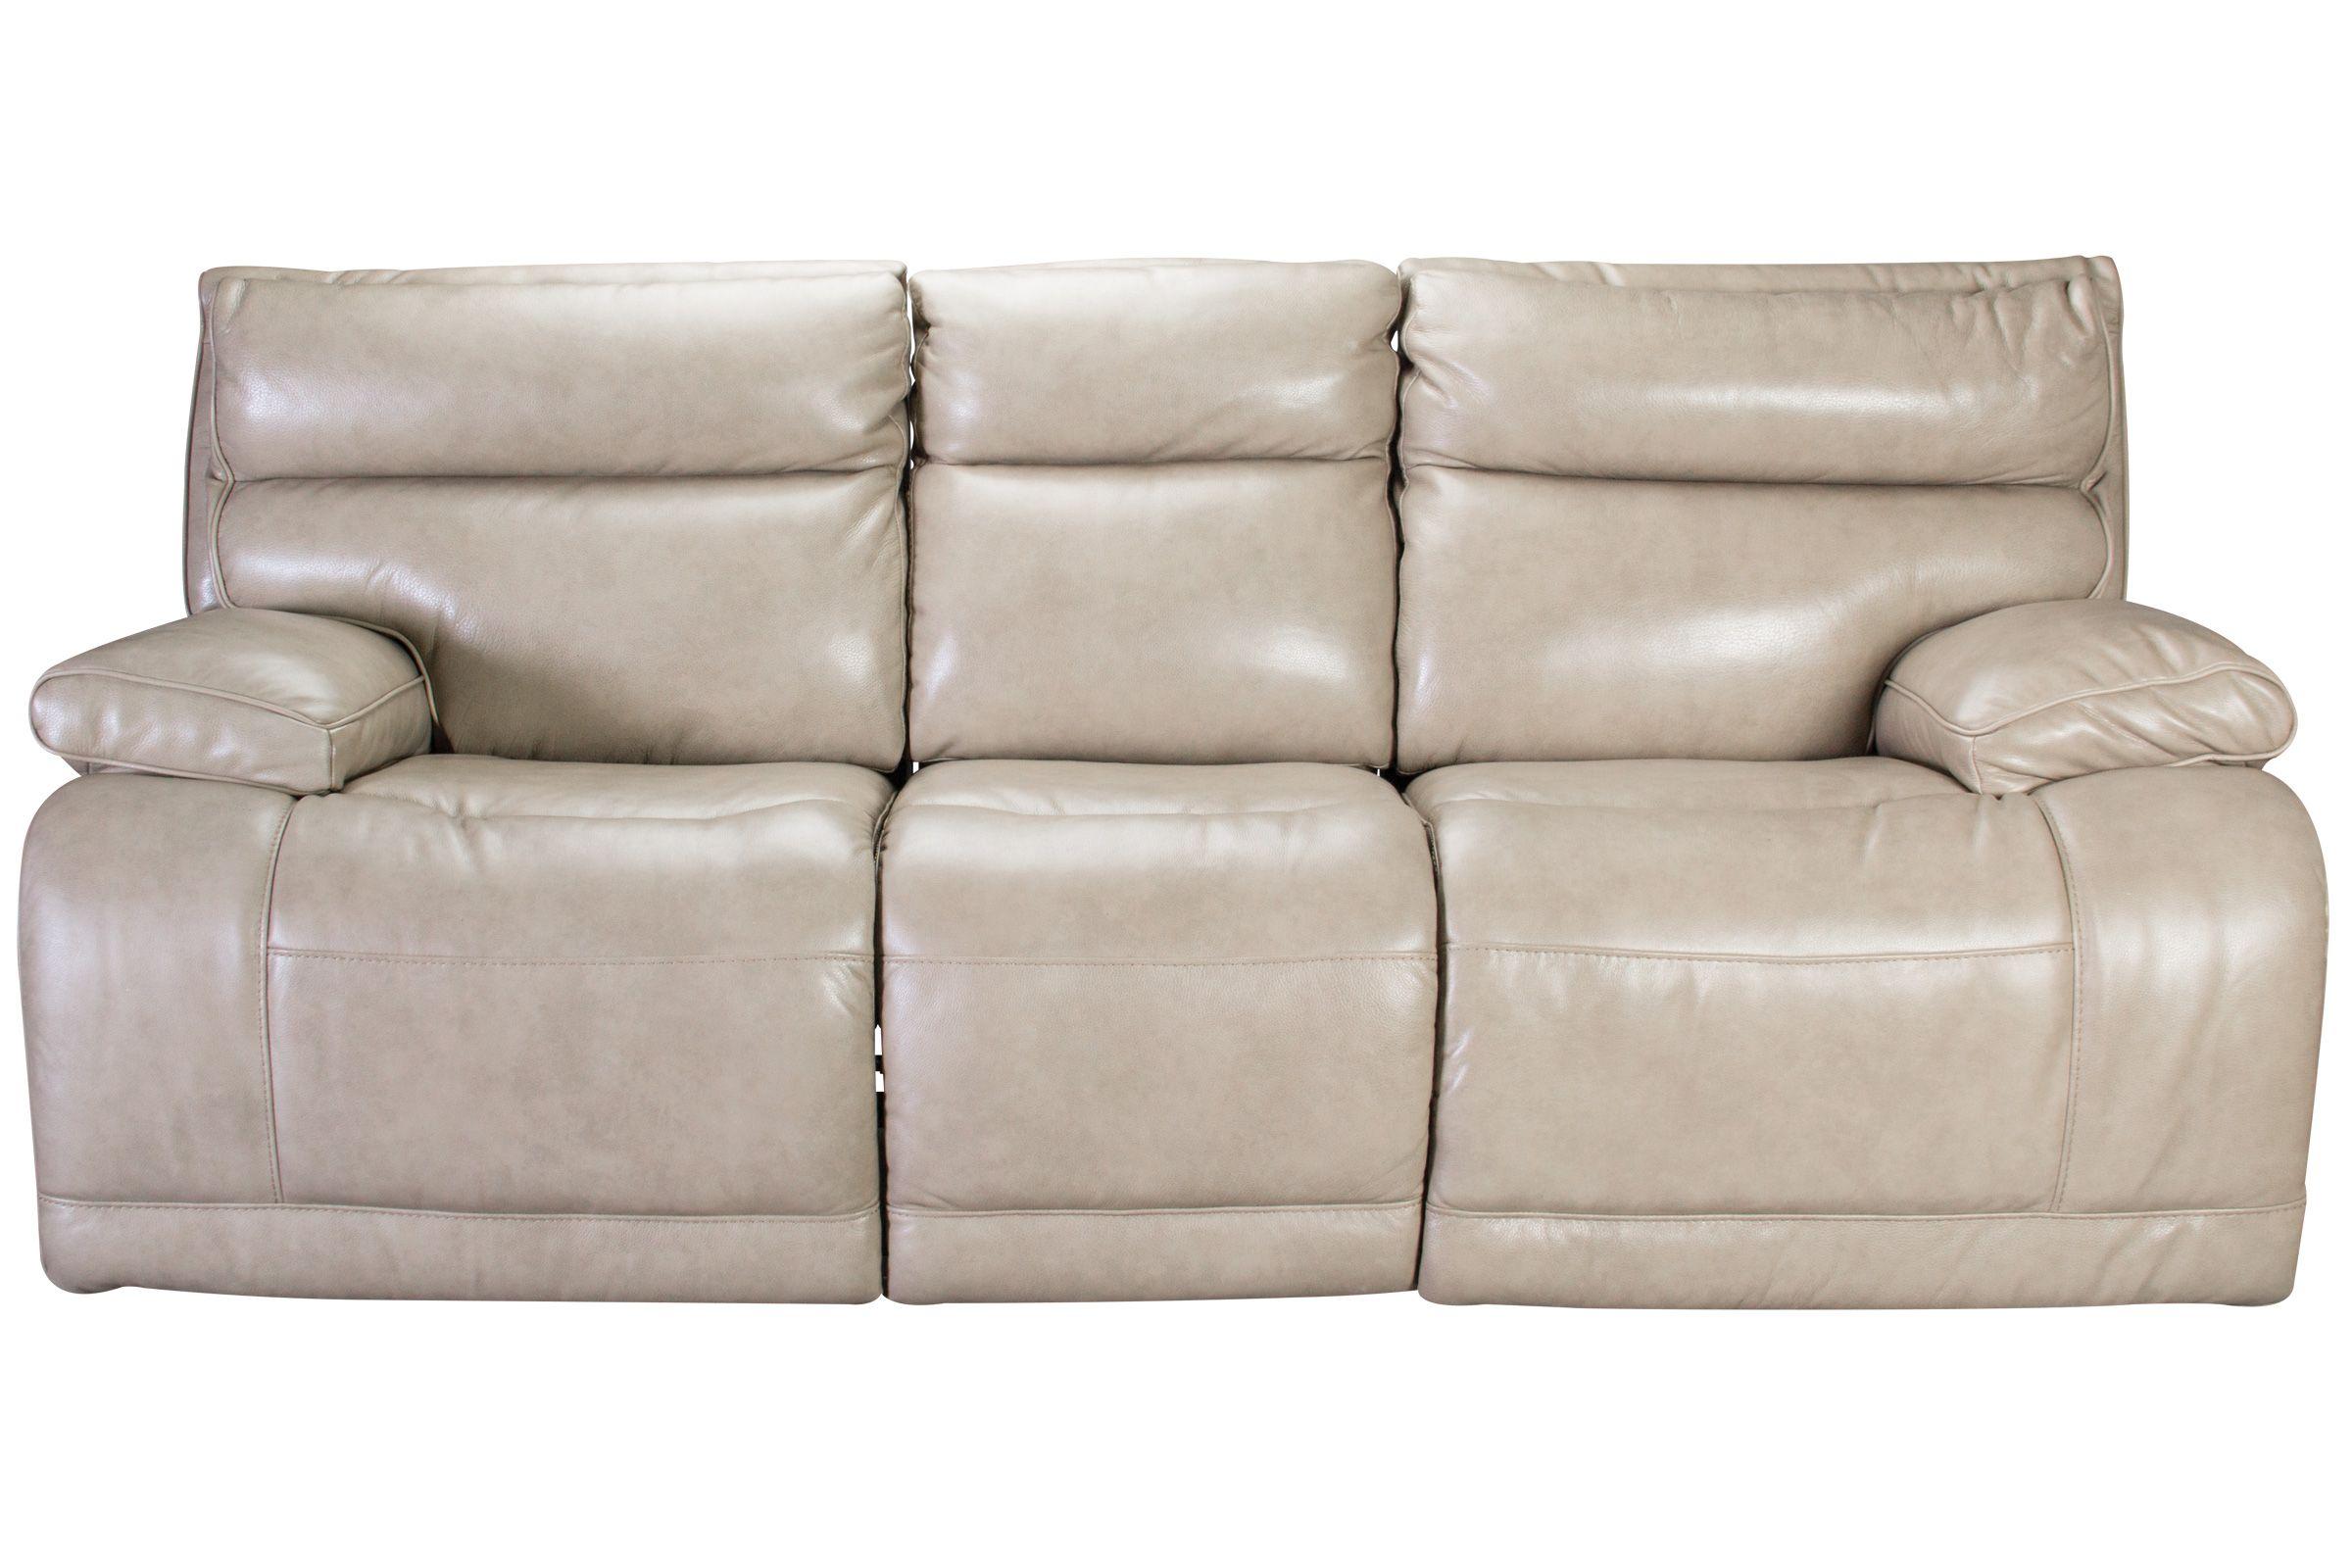 Austin Leather Power Reclining Sofa at Gardner-White